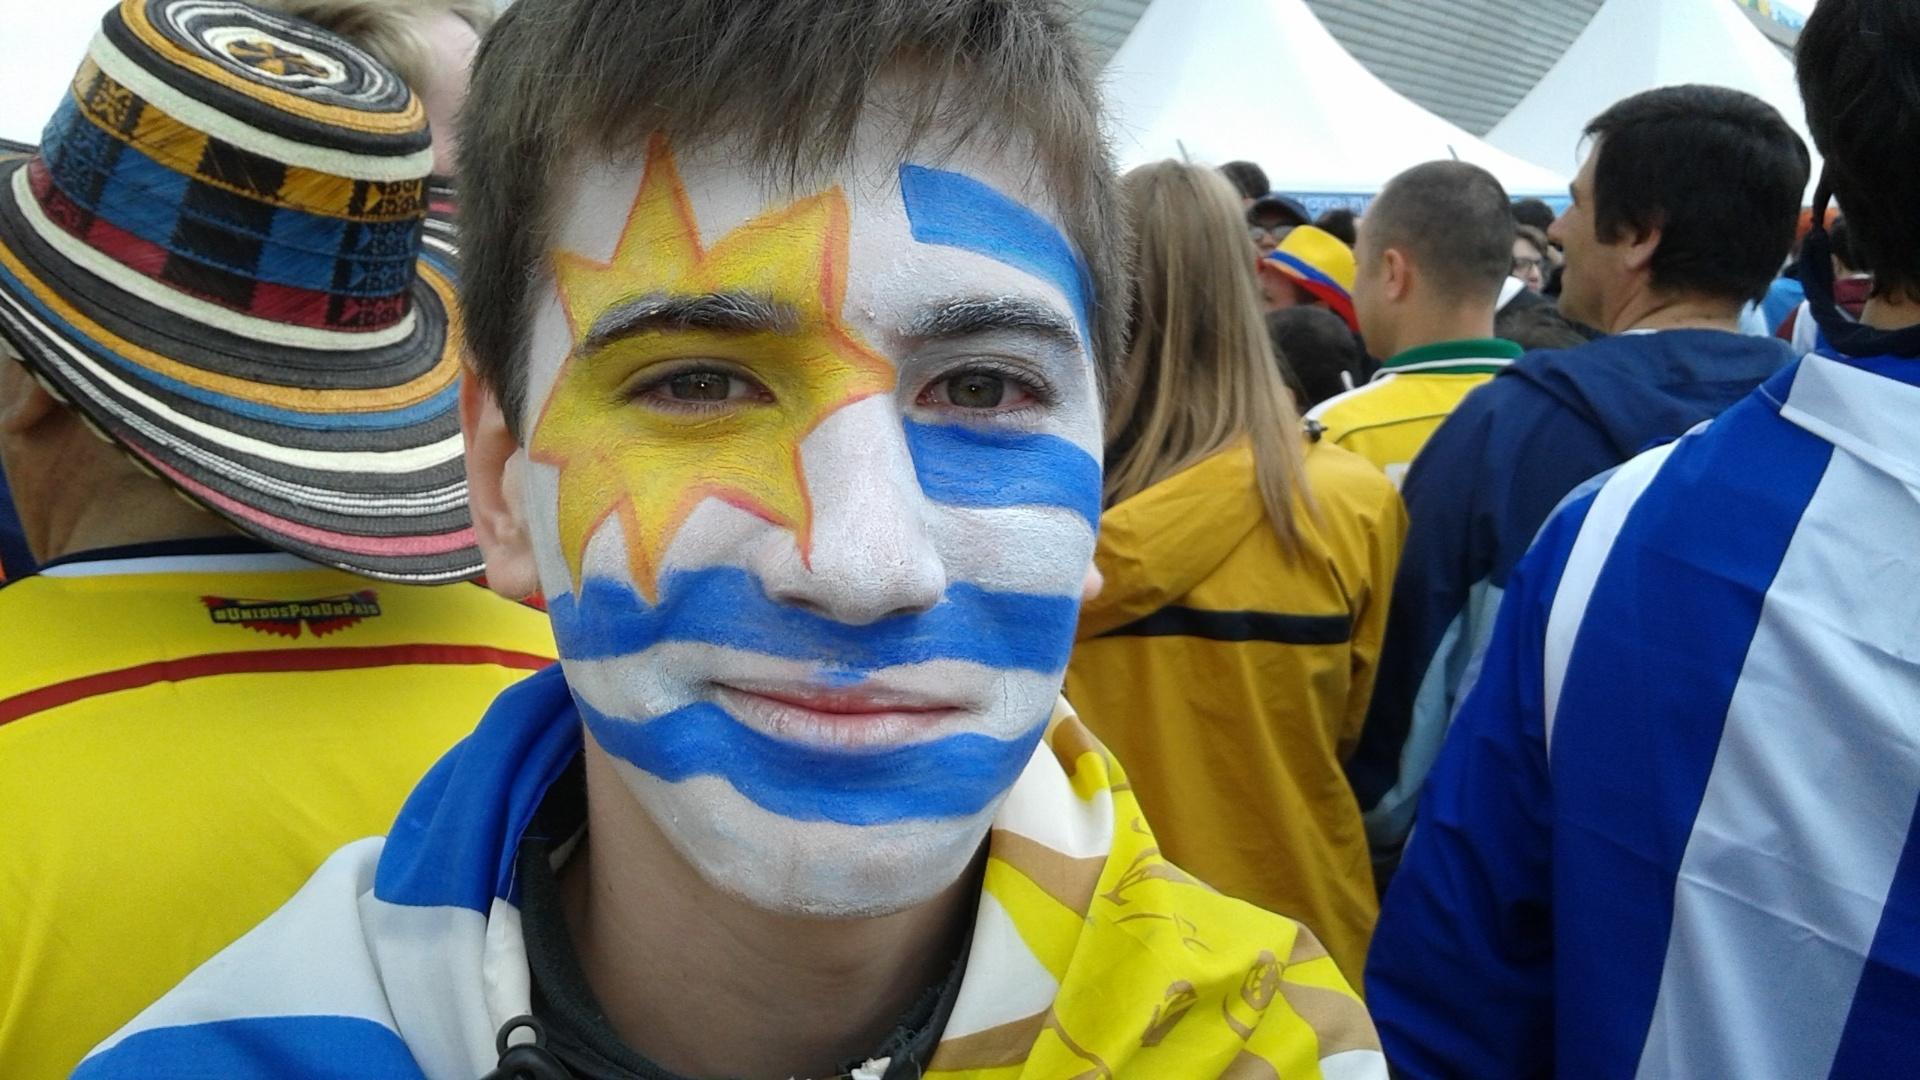 19.jun.2014 - Torcedor pinta o rosto com a bandeira do Uruguai antes do jogo contra a Inglaterra